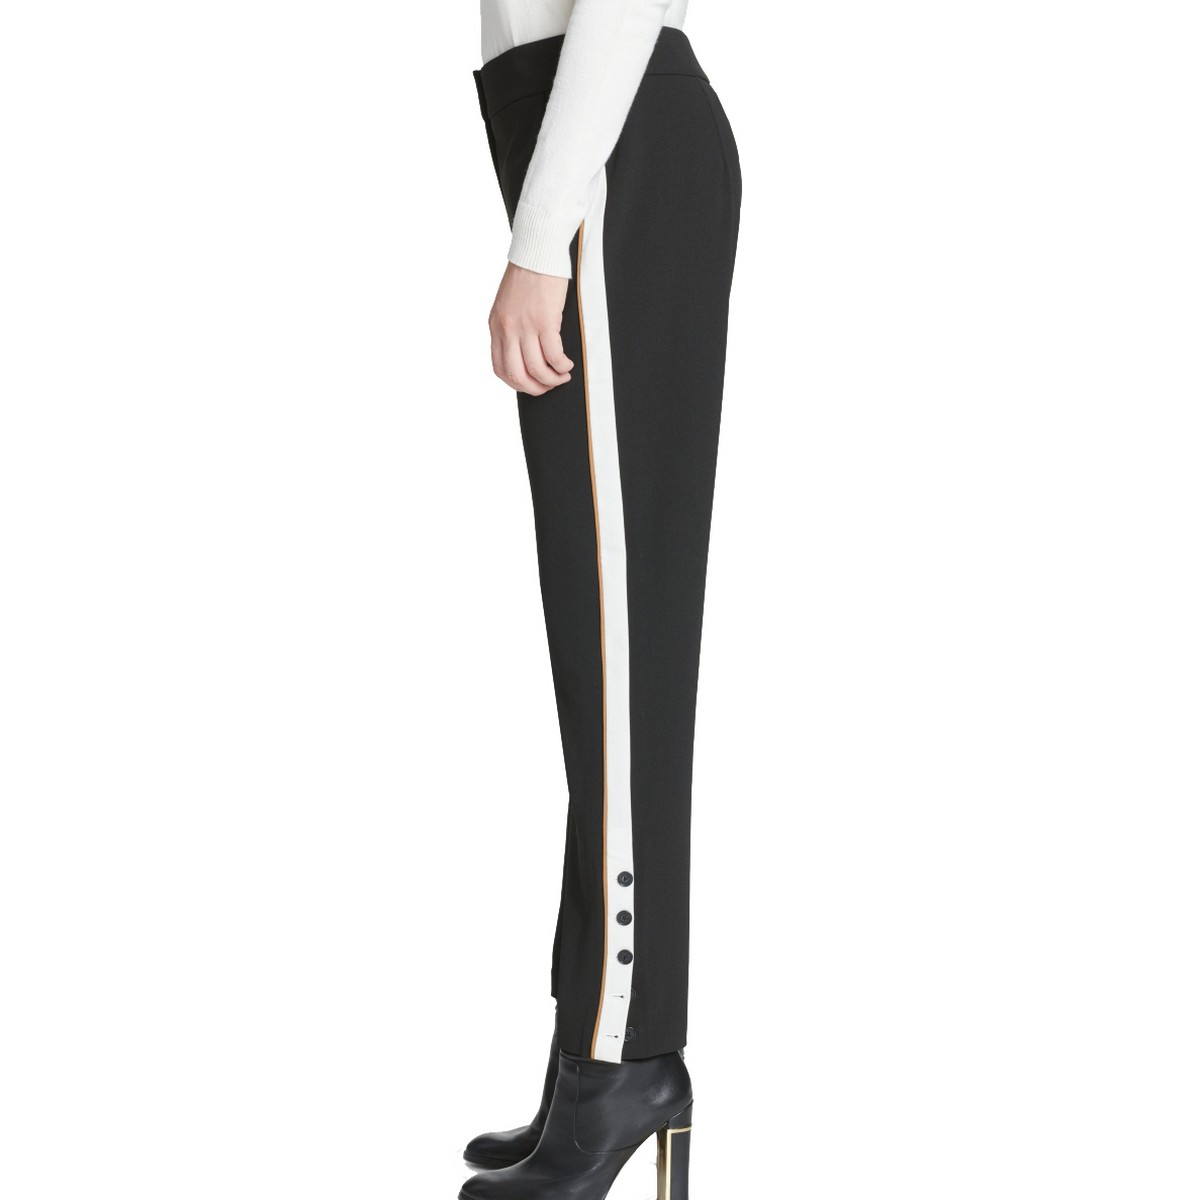 40/% OFF B16127369 Damen 77 Lifestyle Hose Sweat Pant Biker Style Zipper schwarz